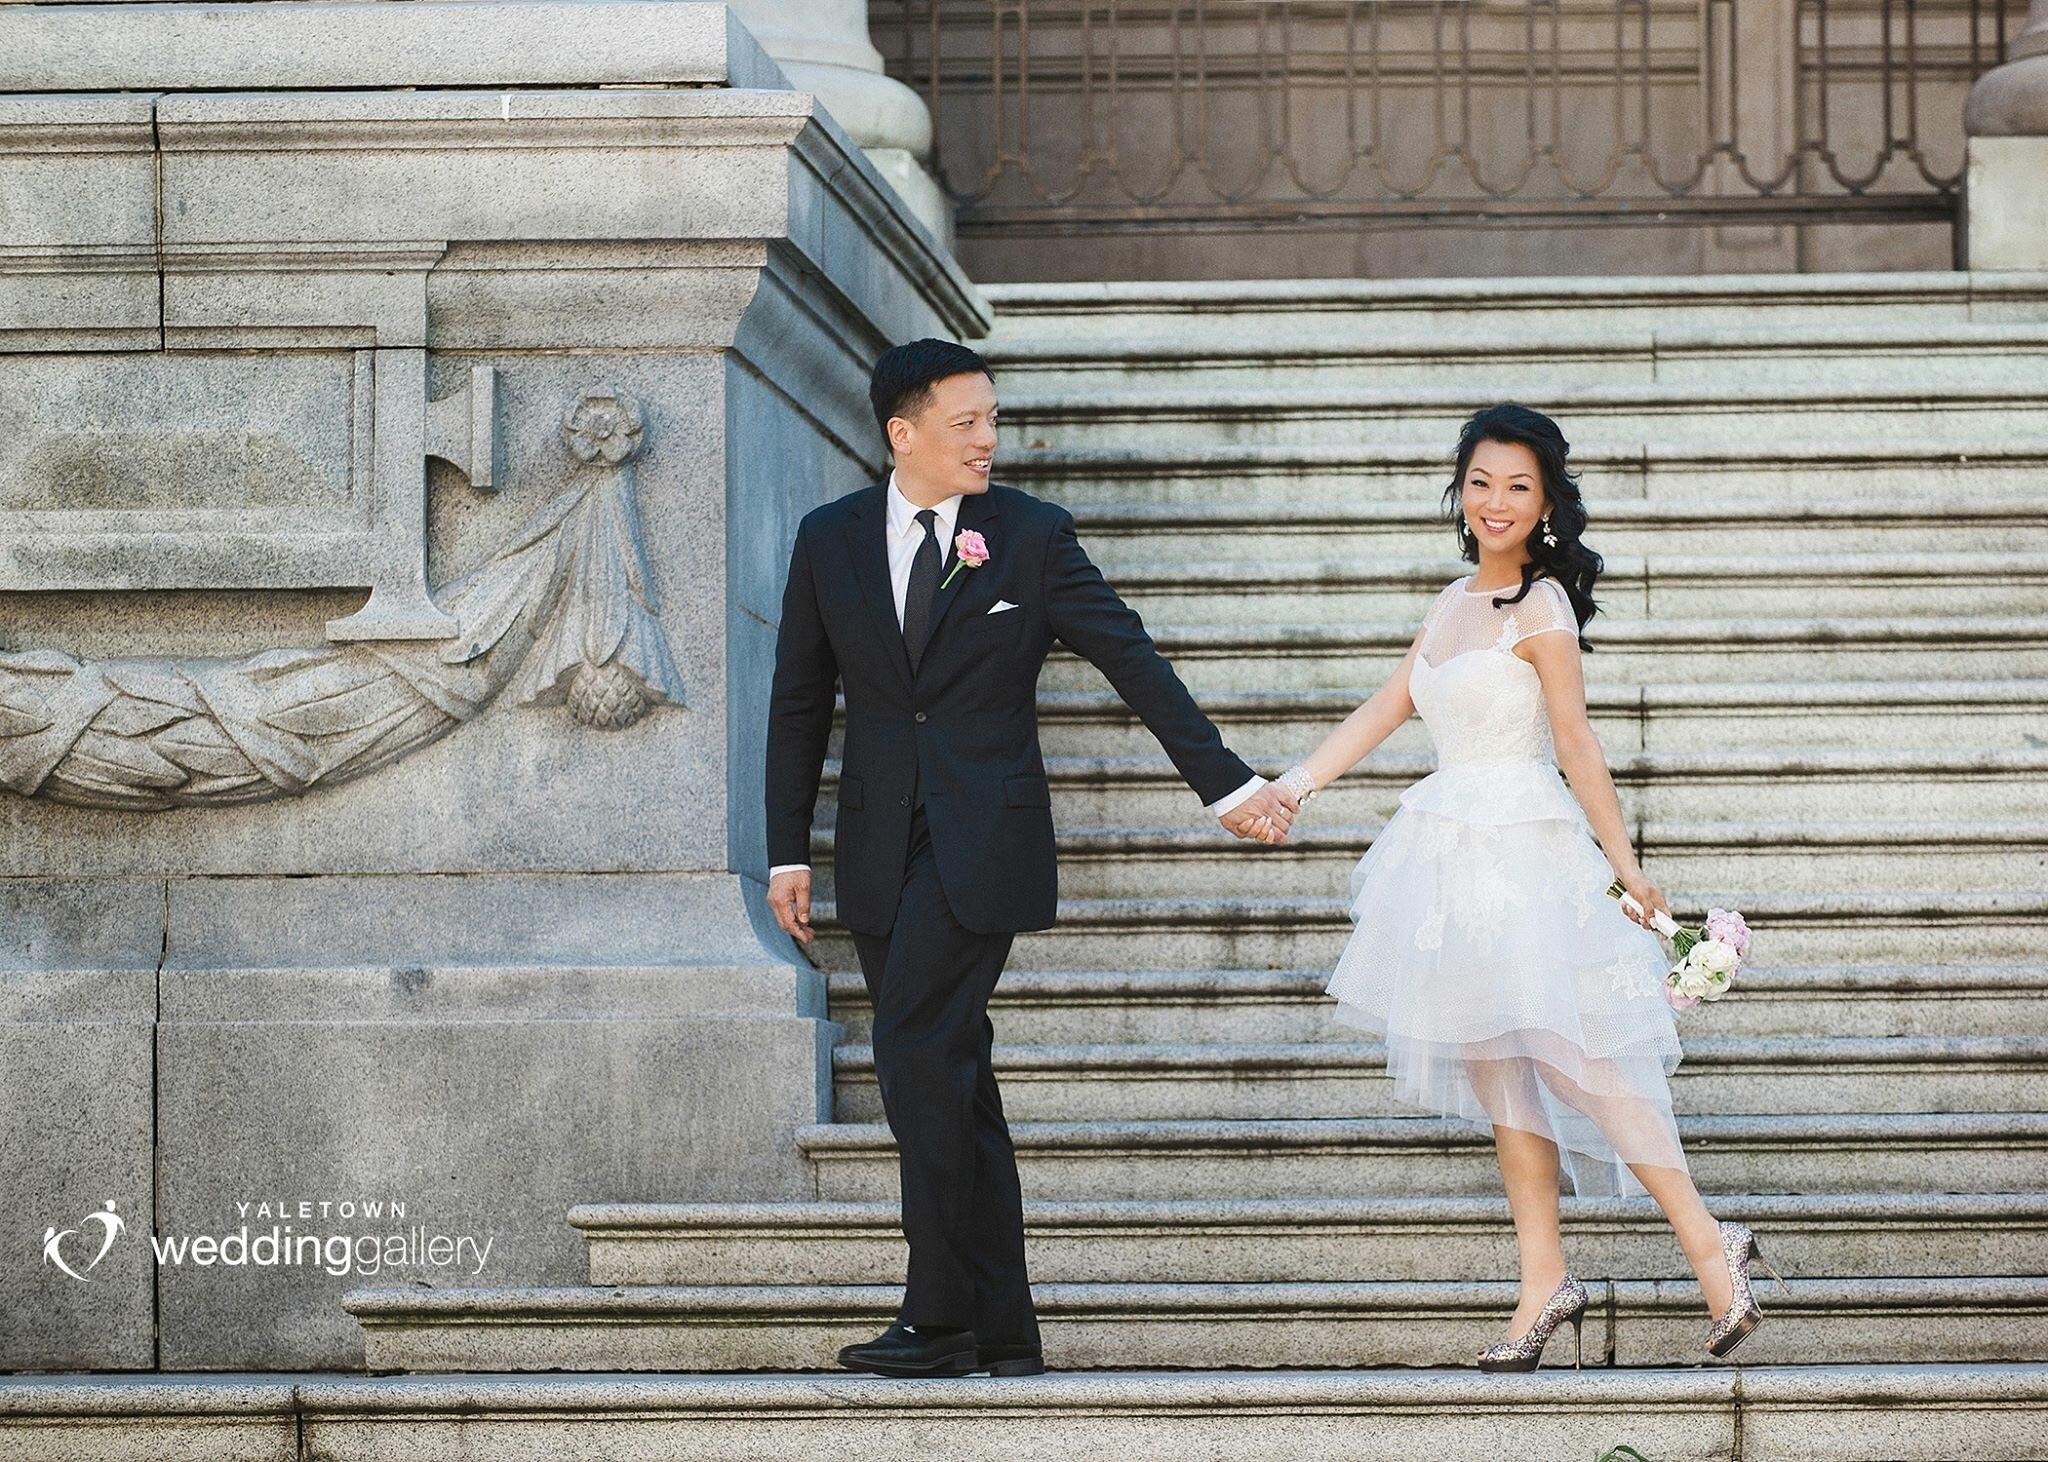 Vancouver Wedding, Yaletown Wedding Photo, Elsa Corsi Wedding Jewelry www.elsacorsi.com